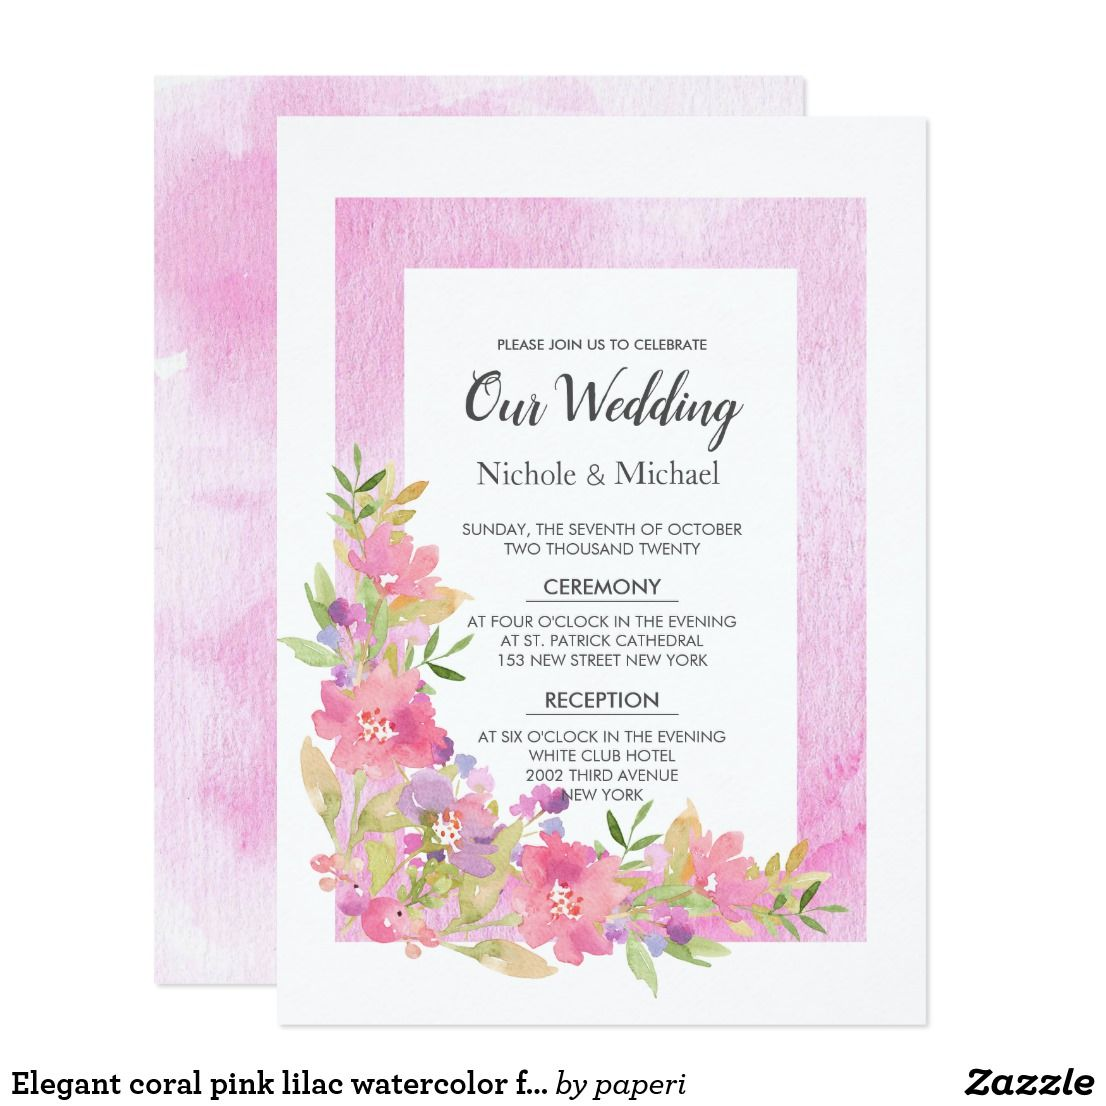 Elegant coral pink lilac watercolor floral Wedding Card | Floral ...